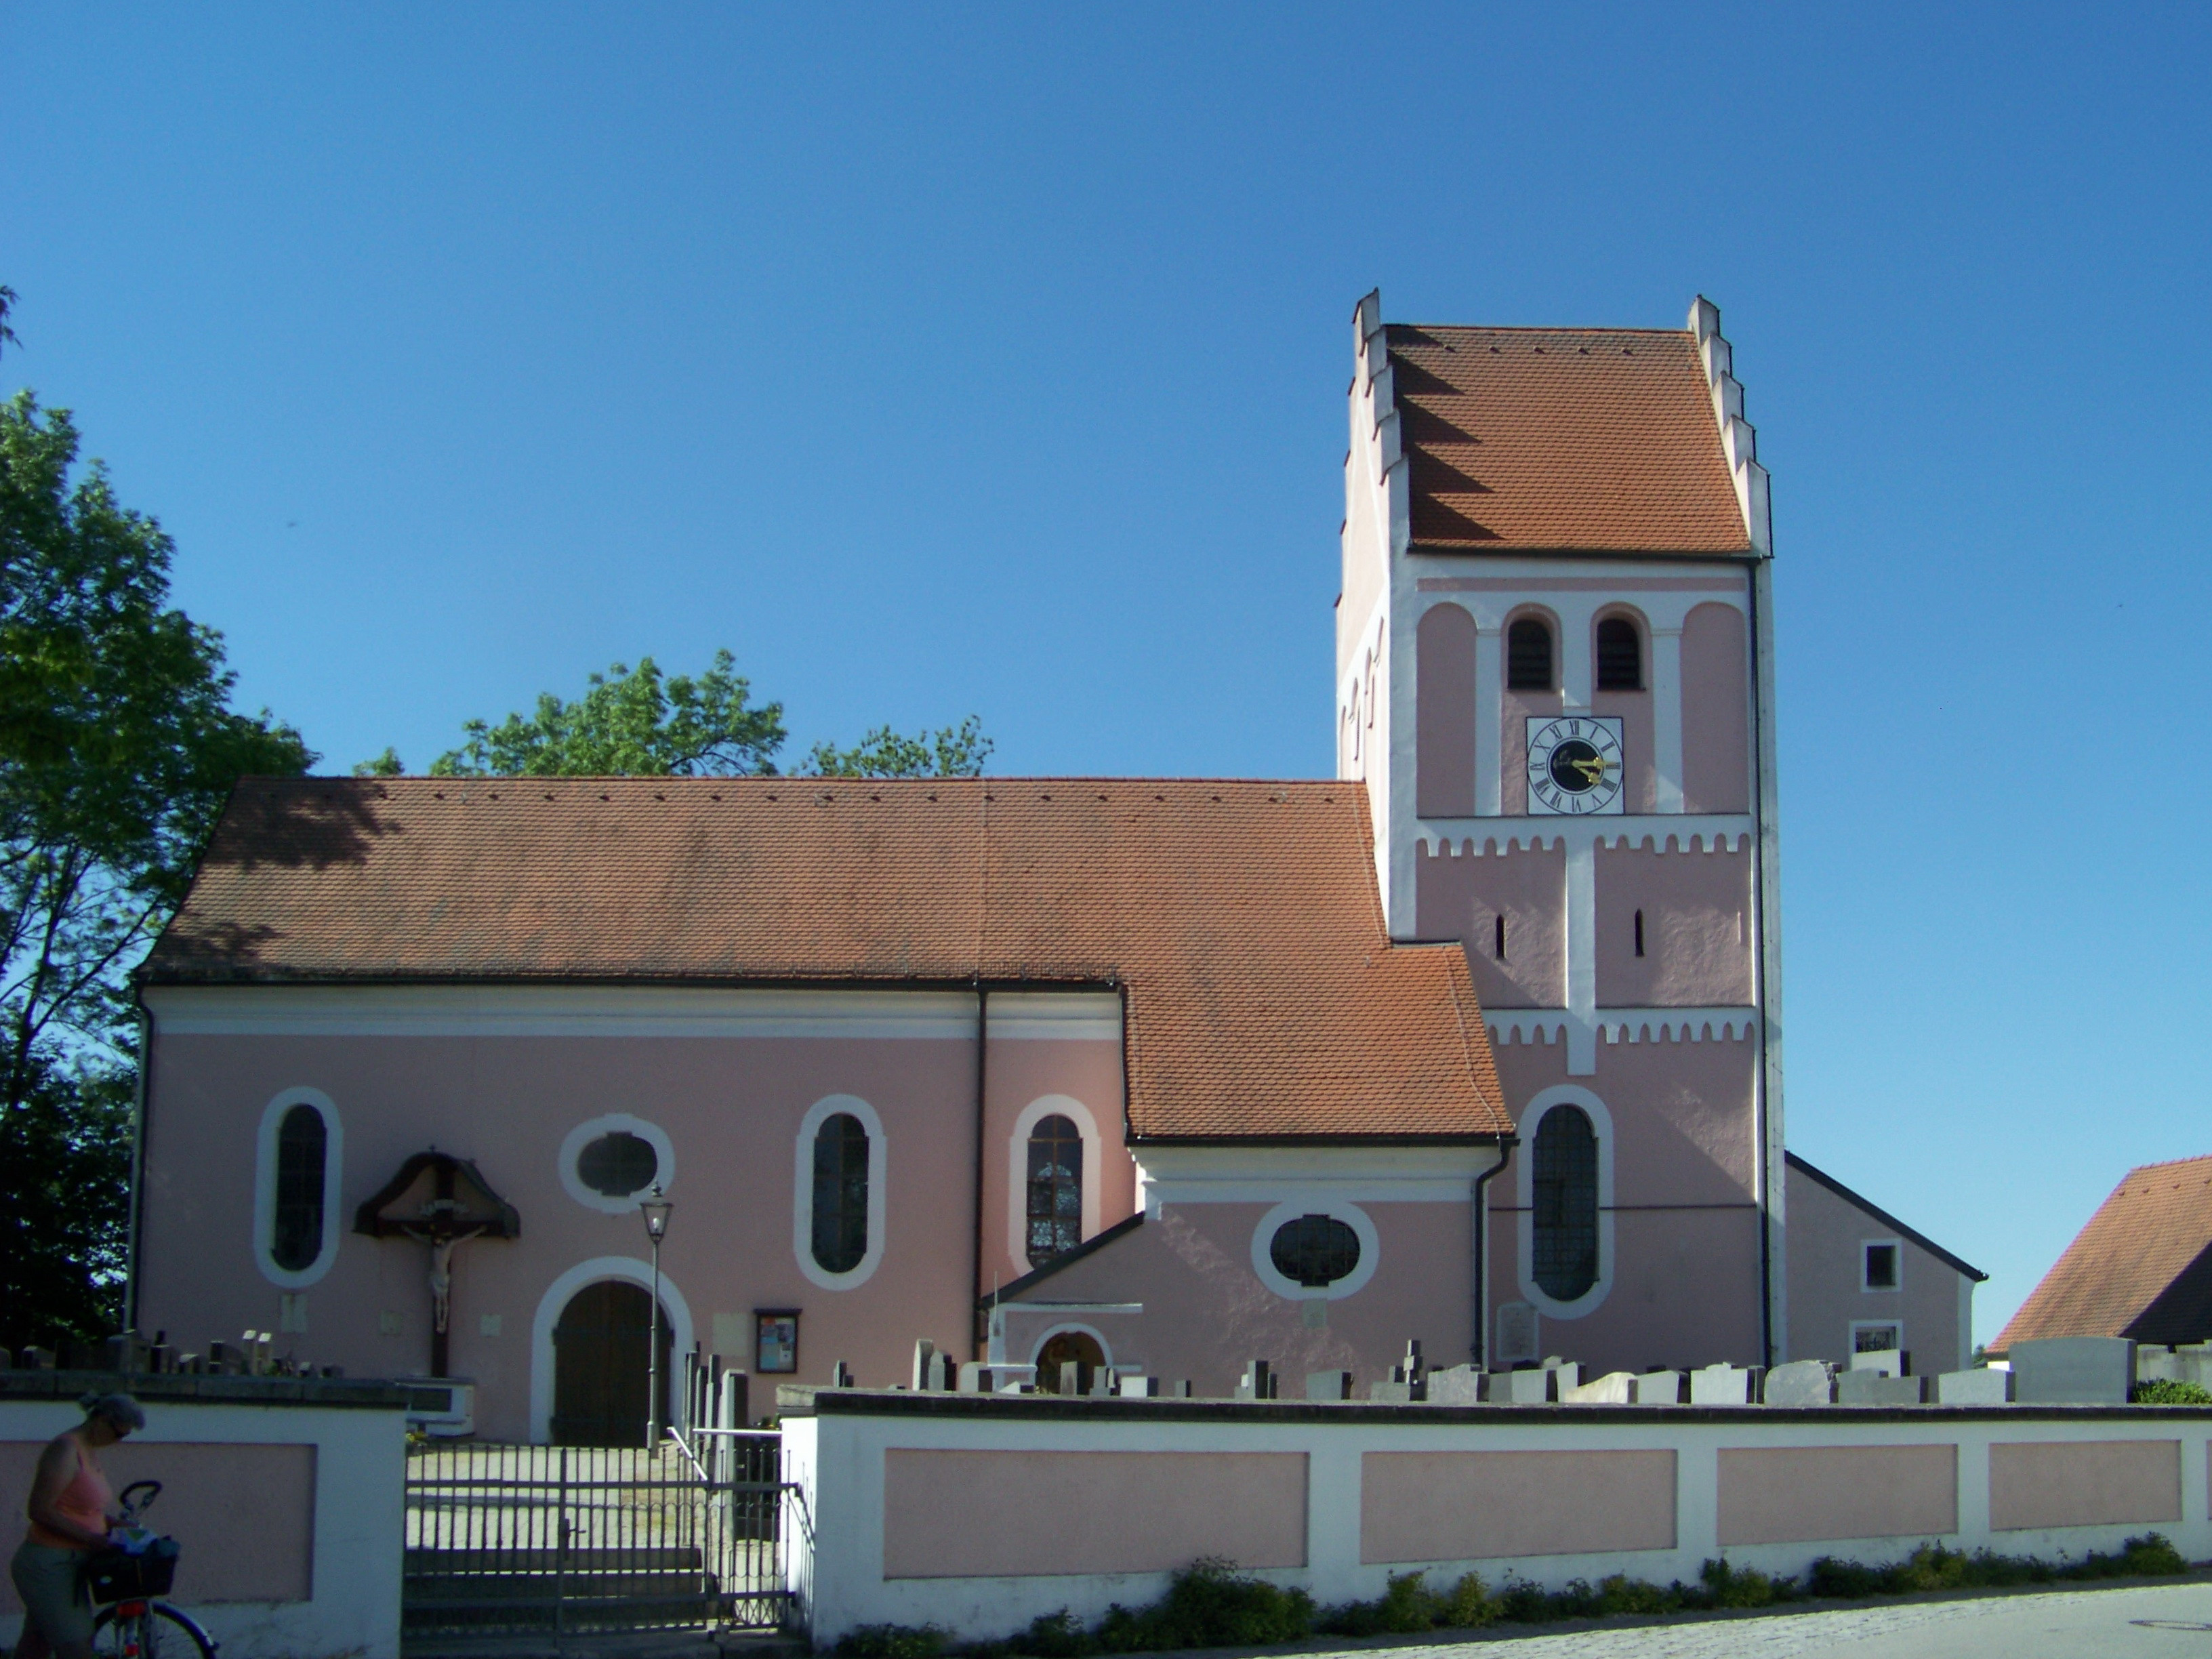 Niederpc3B6Ring 25 Pfarrkirche Sankt Bartholomc3A4Us